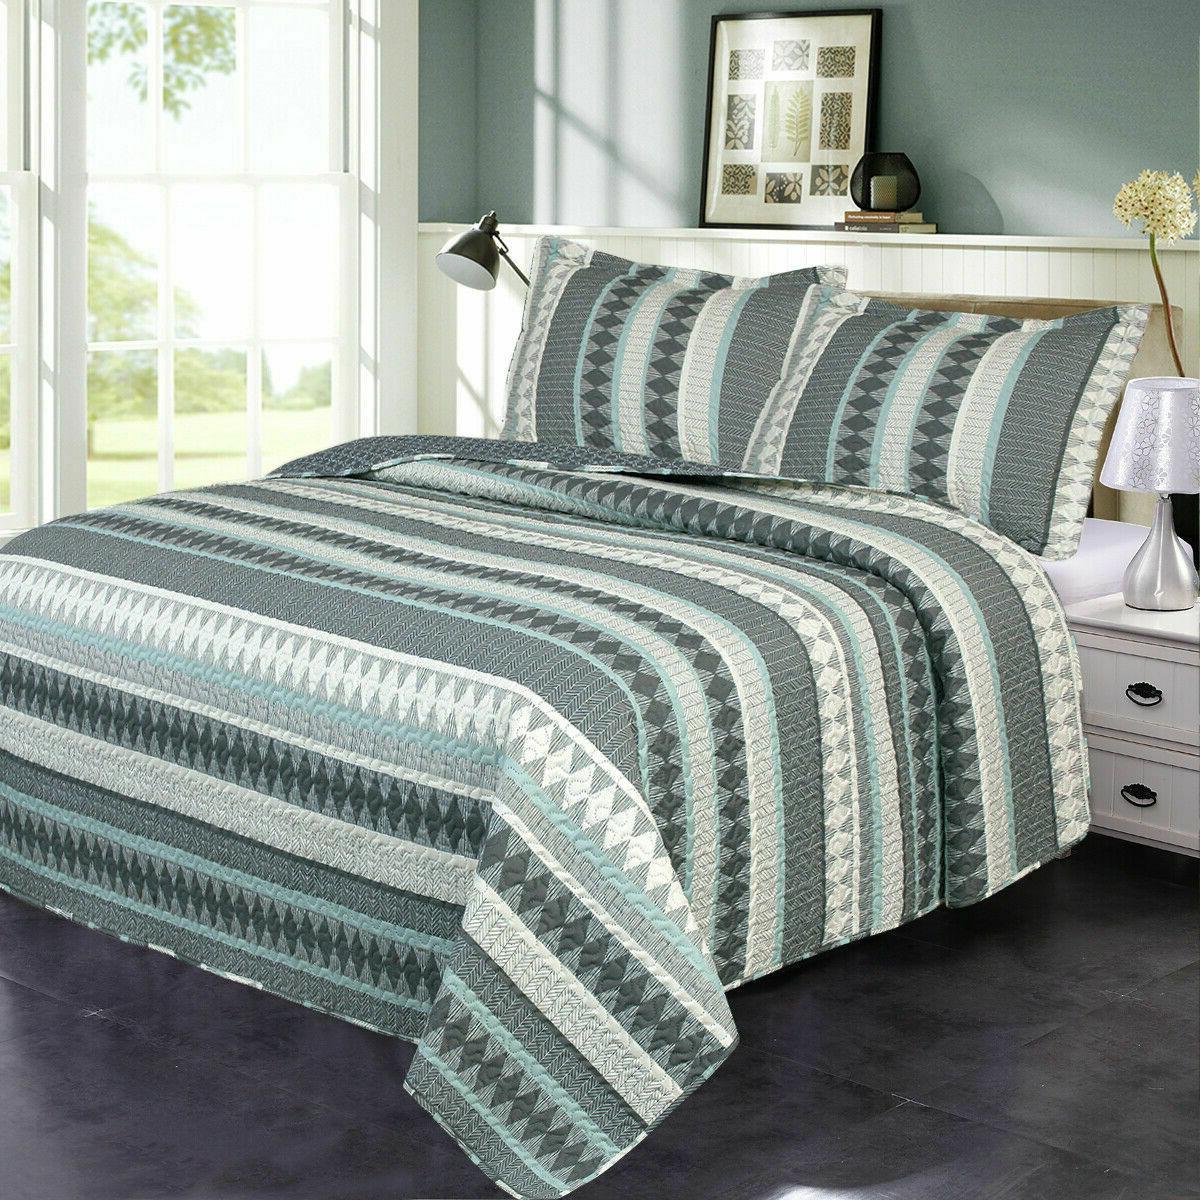 3 Quilt Set Bedspread w/ 2 shams